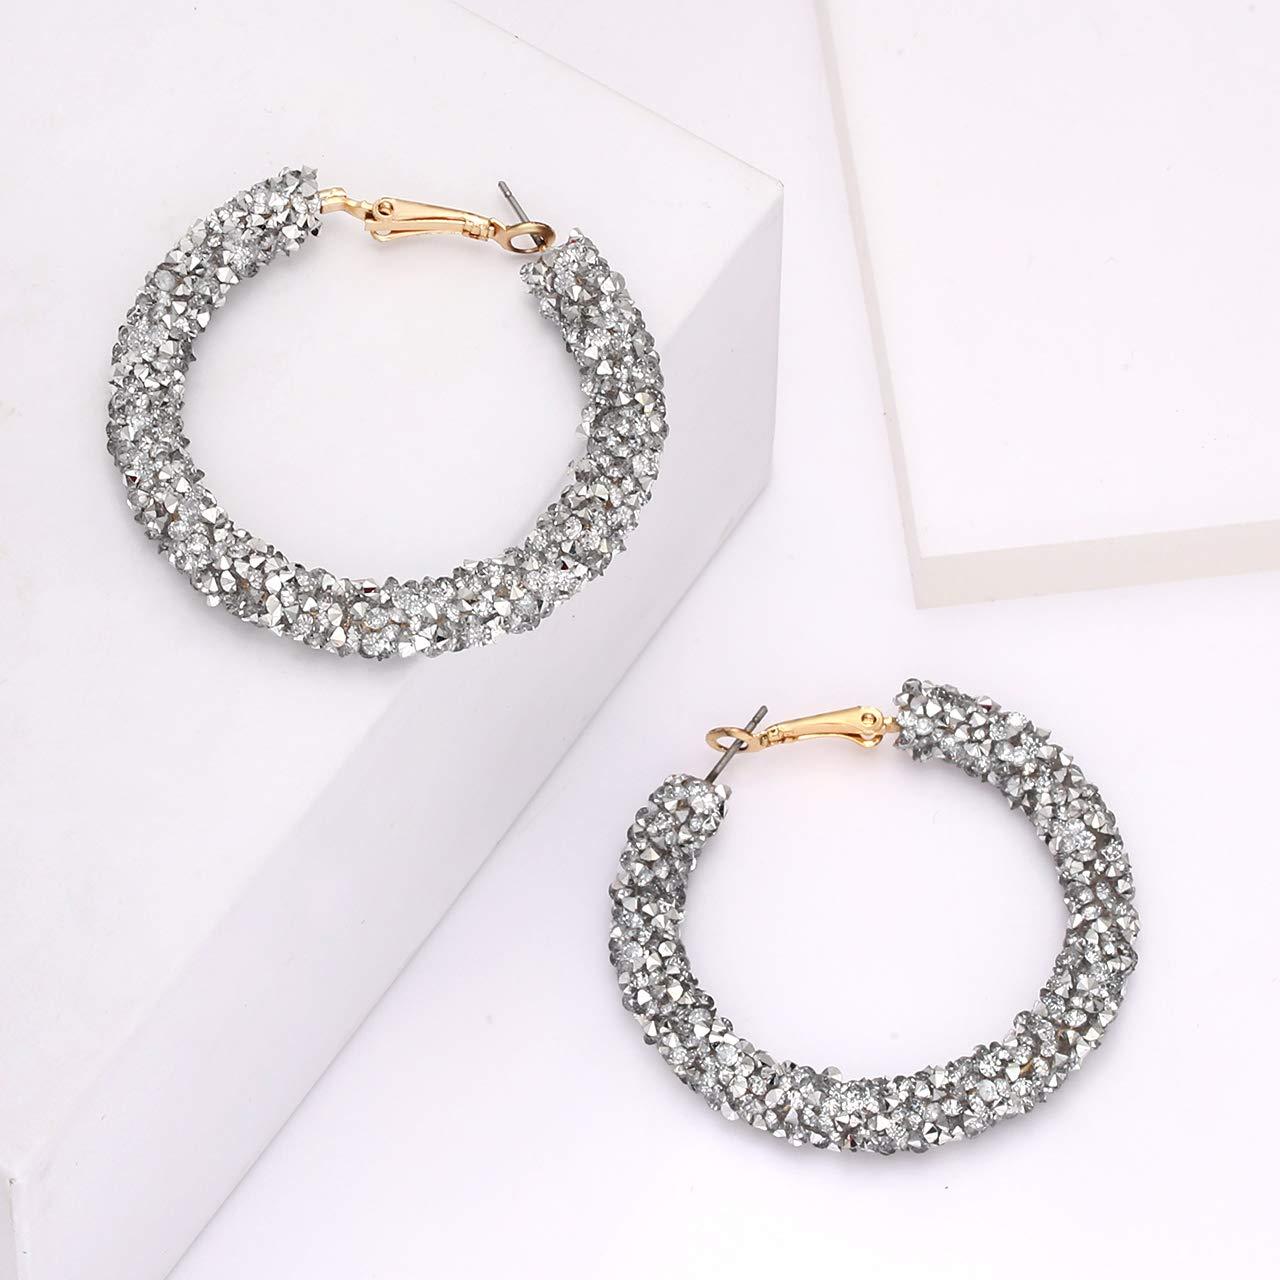 NLCAC Glitter Hoop Earrings Bohemian Sparkle Resin Rhinestone Wrapped Hoop Dangle Earrings for Women Girls